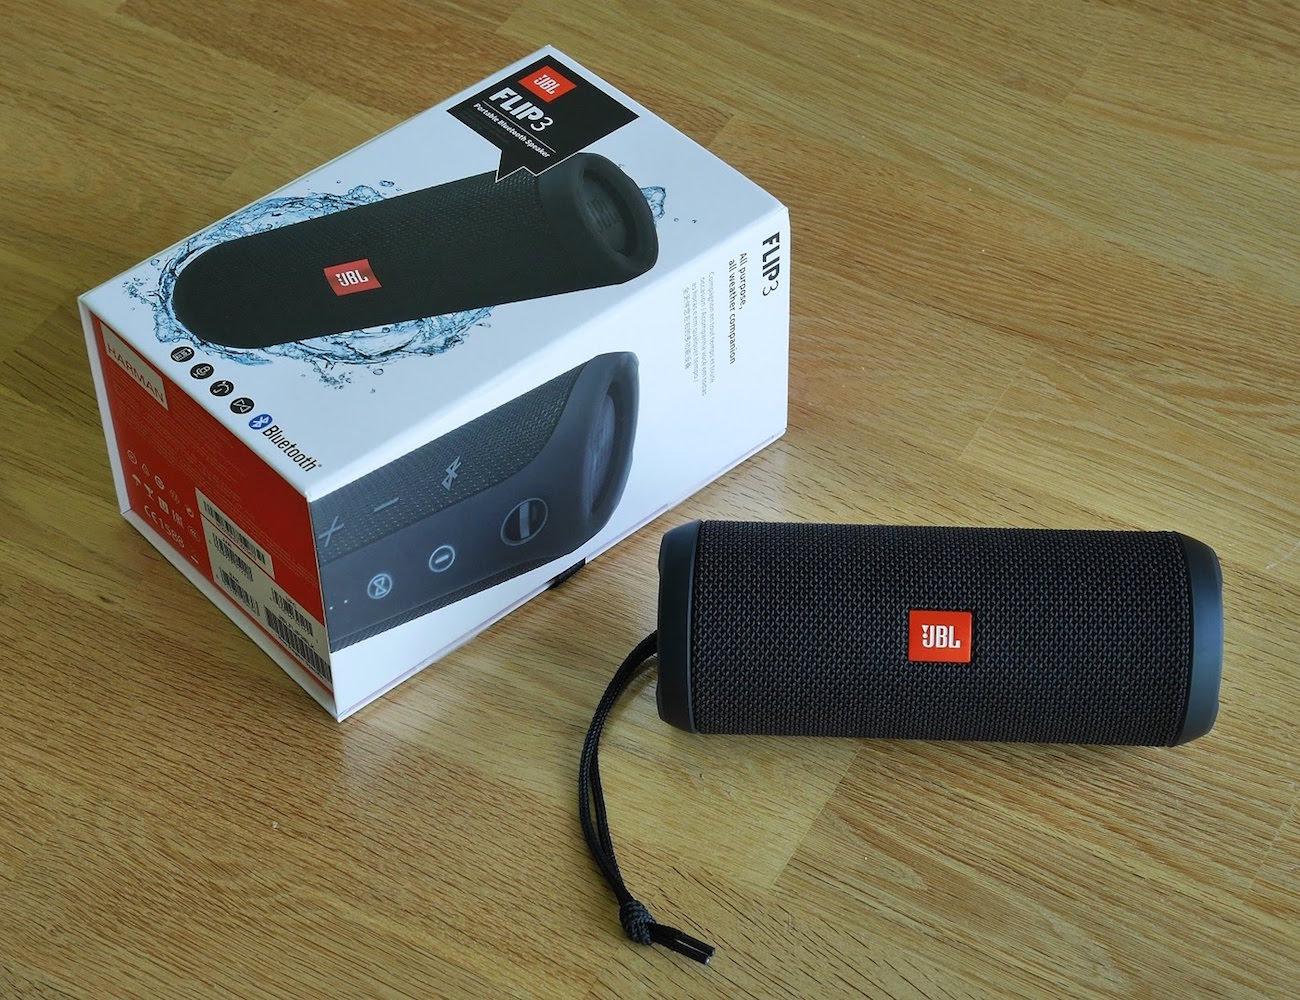 JBL Flip 3 – Splashproof Portable Bluetooth Speaker